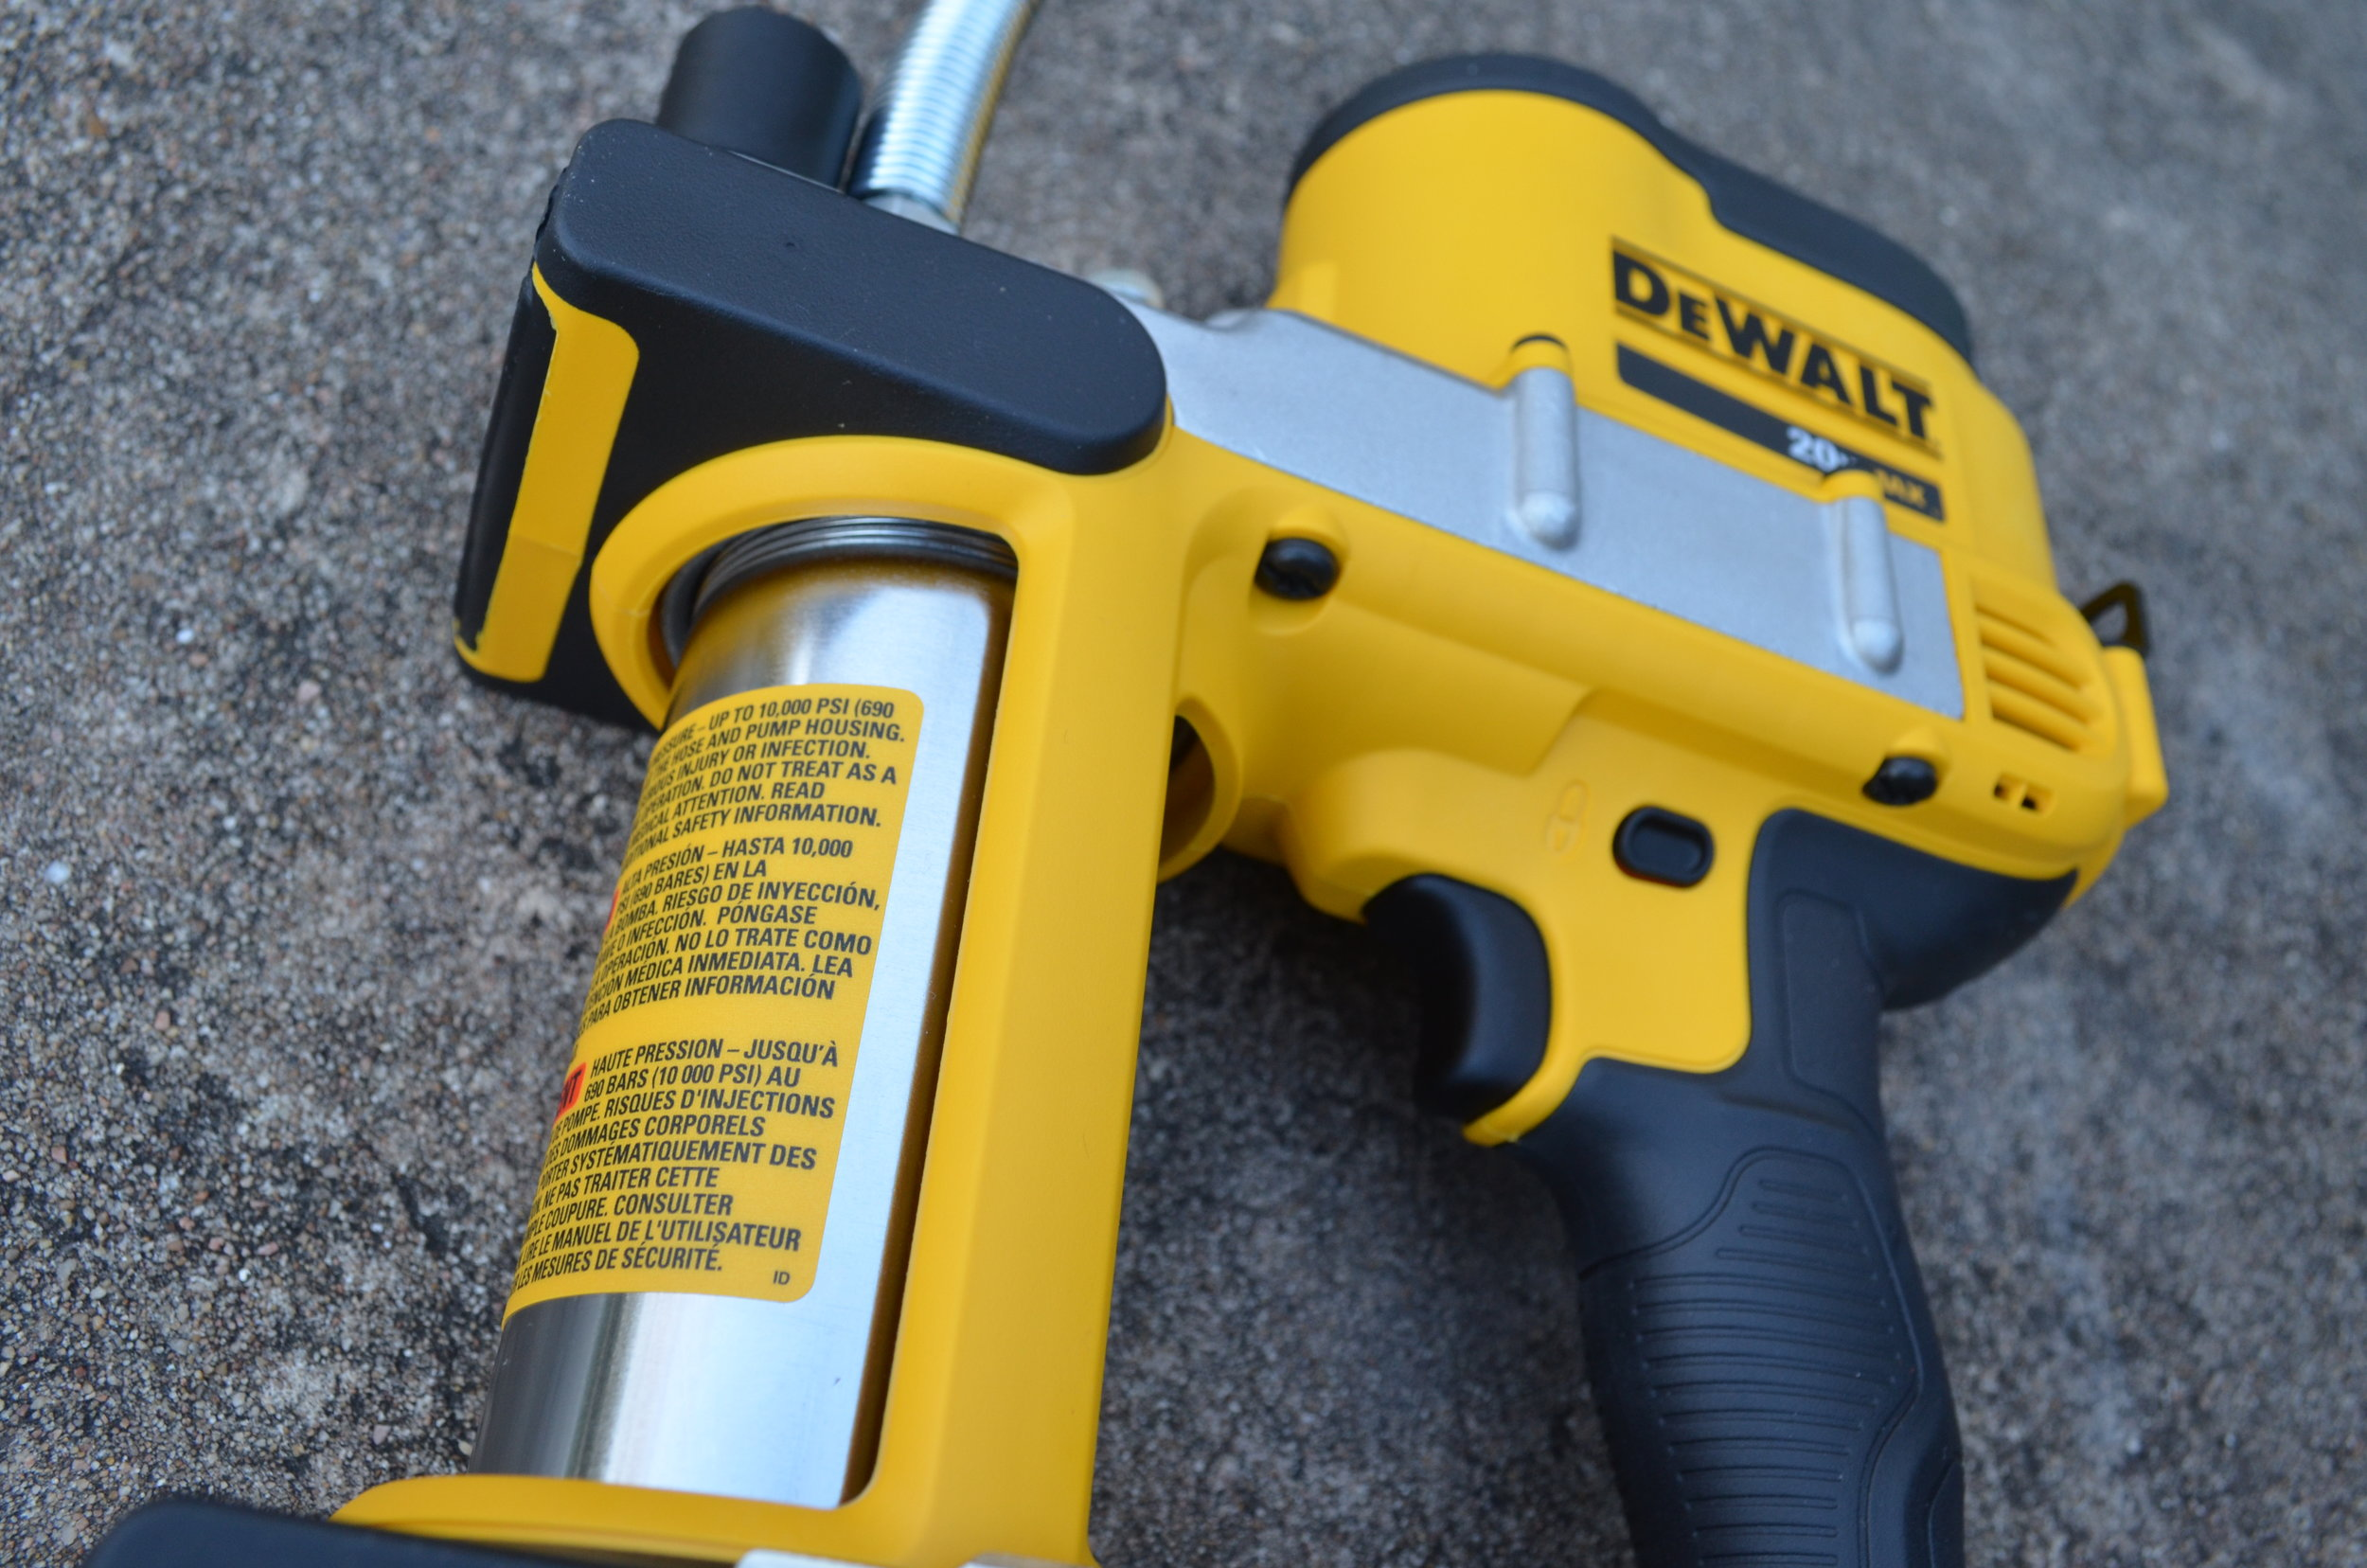 dewalt-cordless-grease-gun-battery-tank